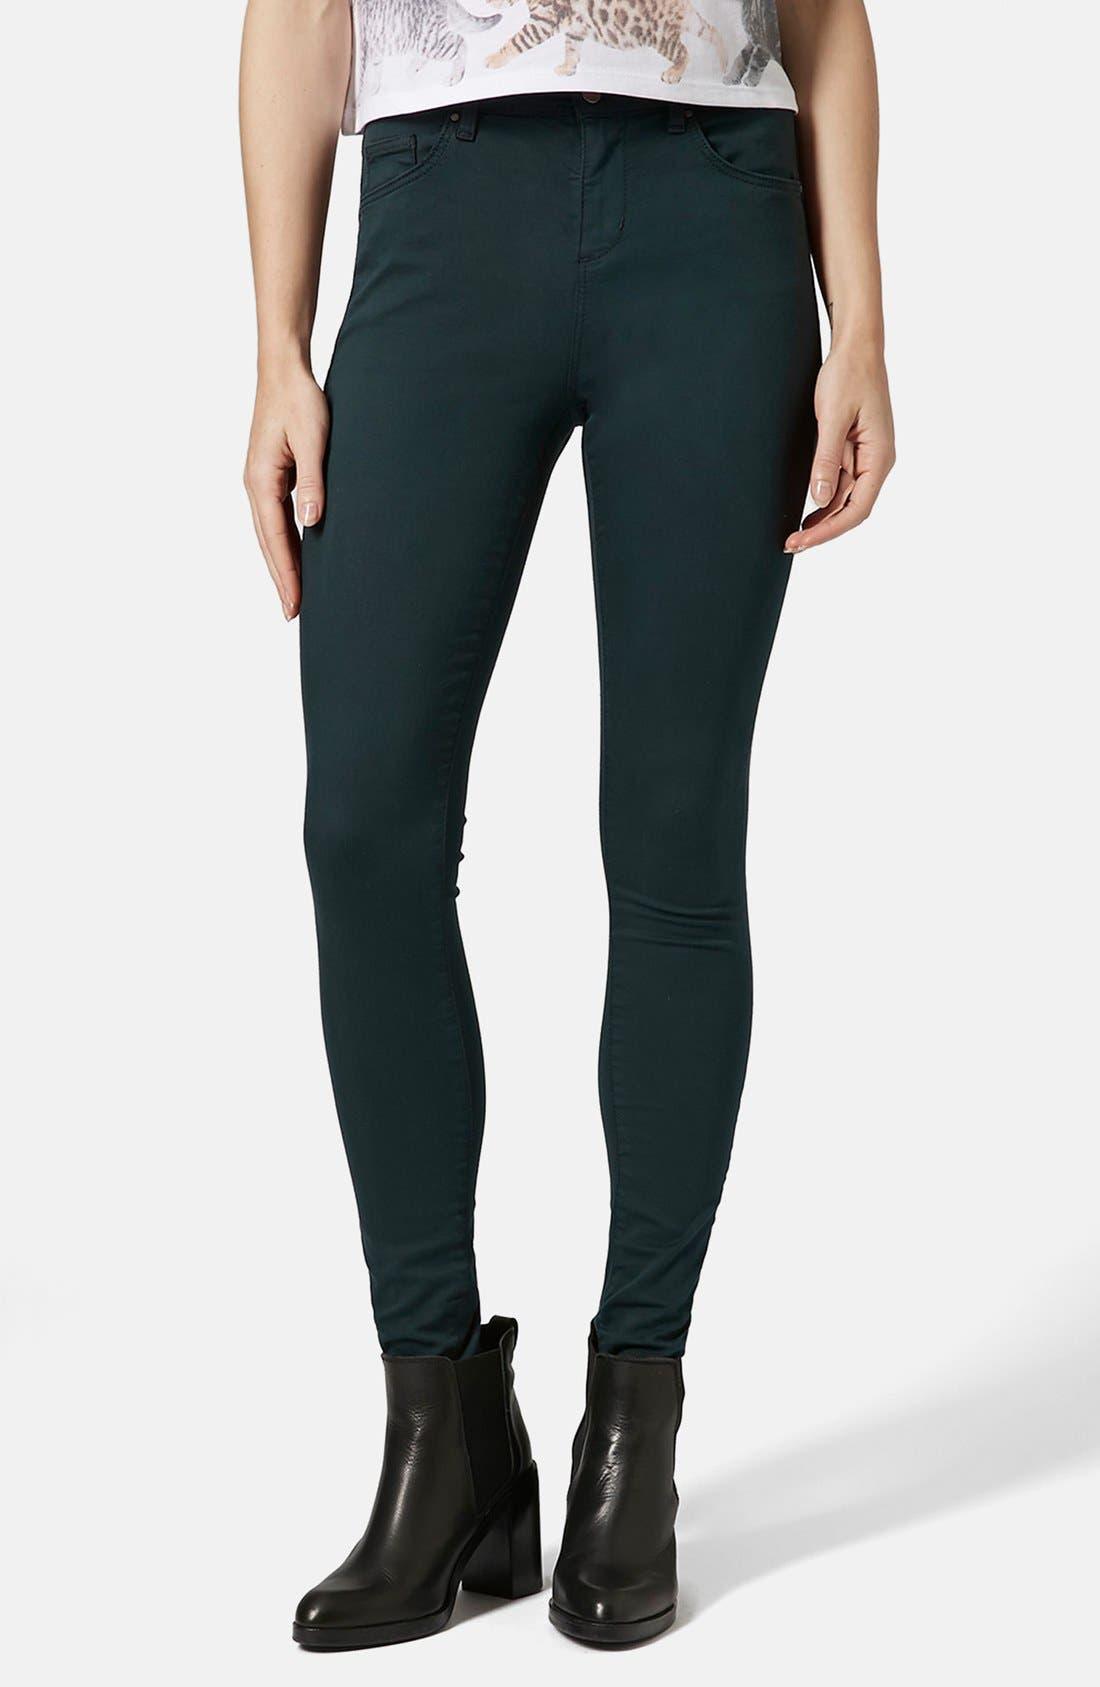 Alternate Image 1 Selected - Topshop Moto 'Leigh' High Rise Skinny Jeans (Teal) (Regular & Short)